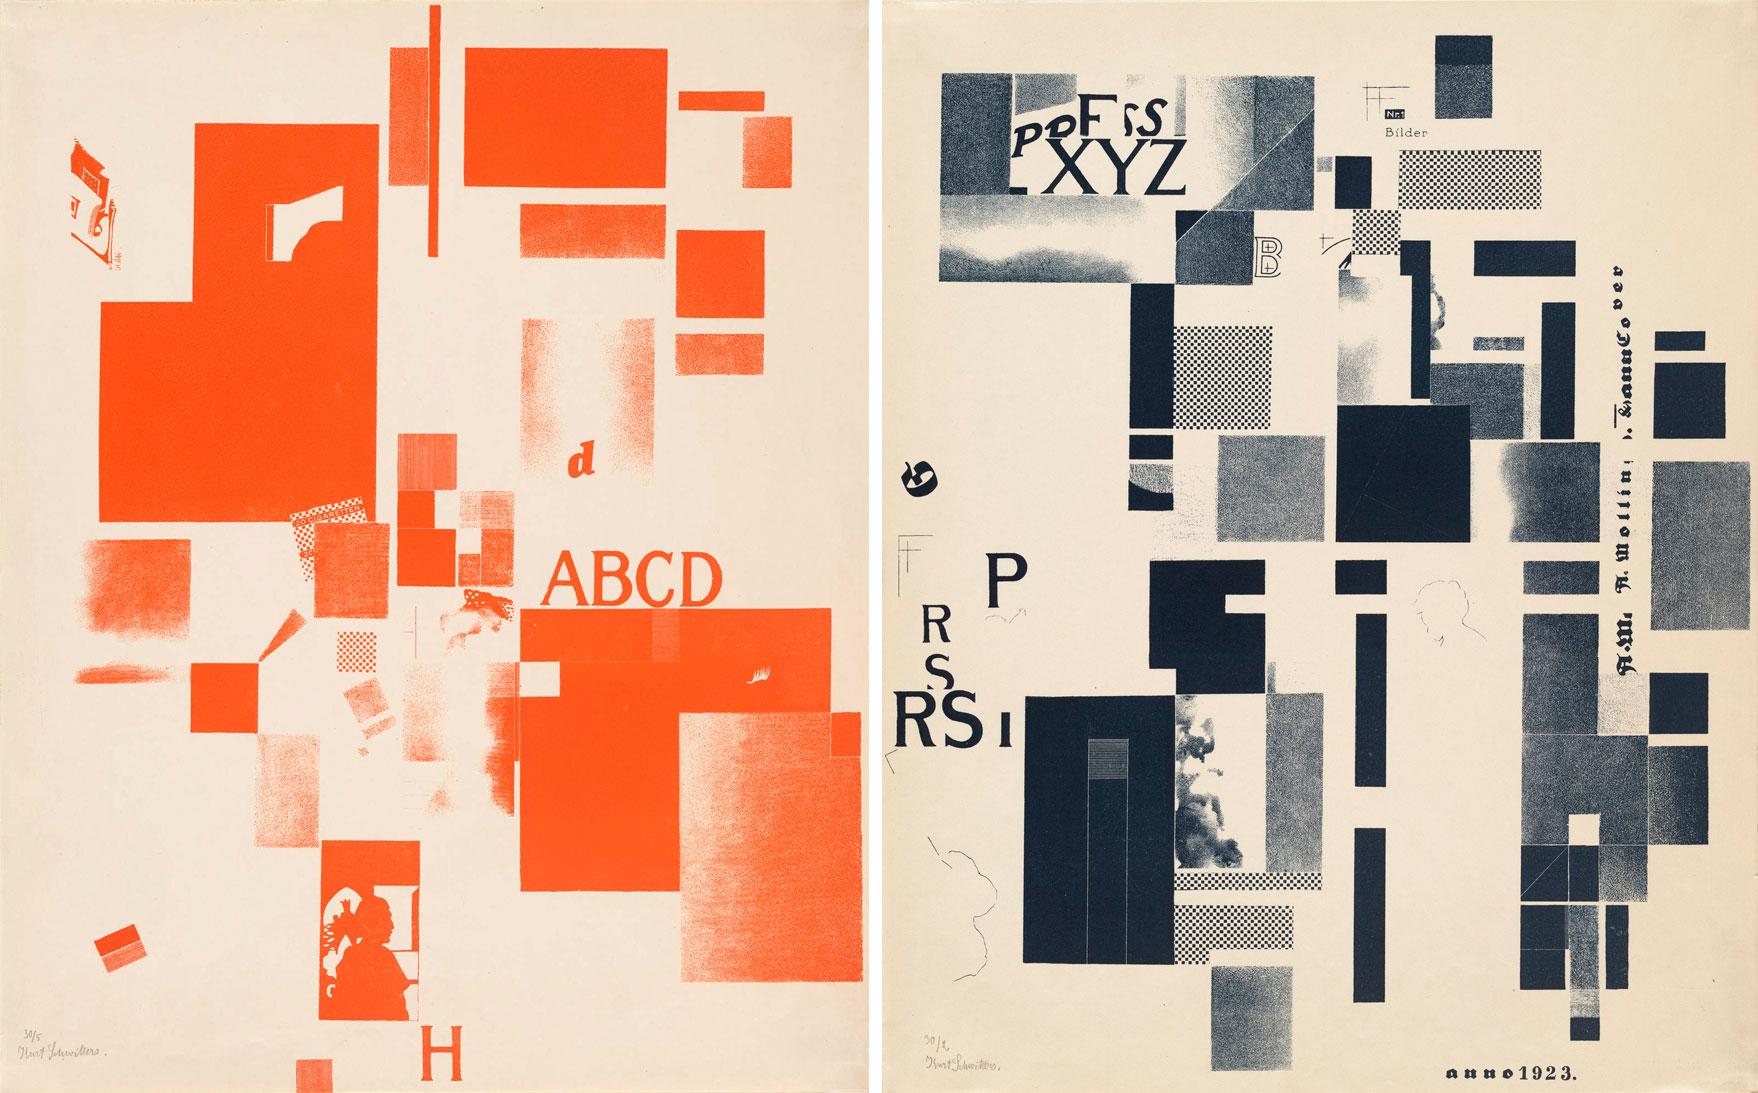 Kurt-Schwitters-Plates-from-Merz-3-1923